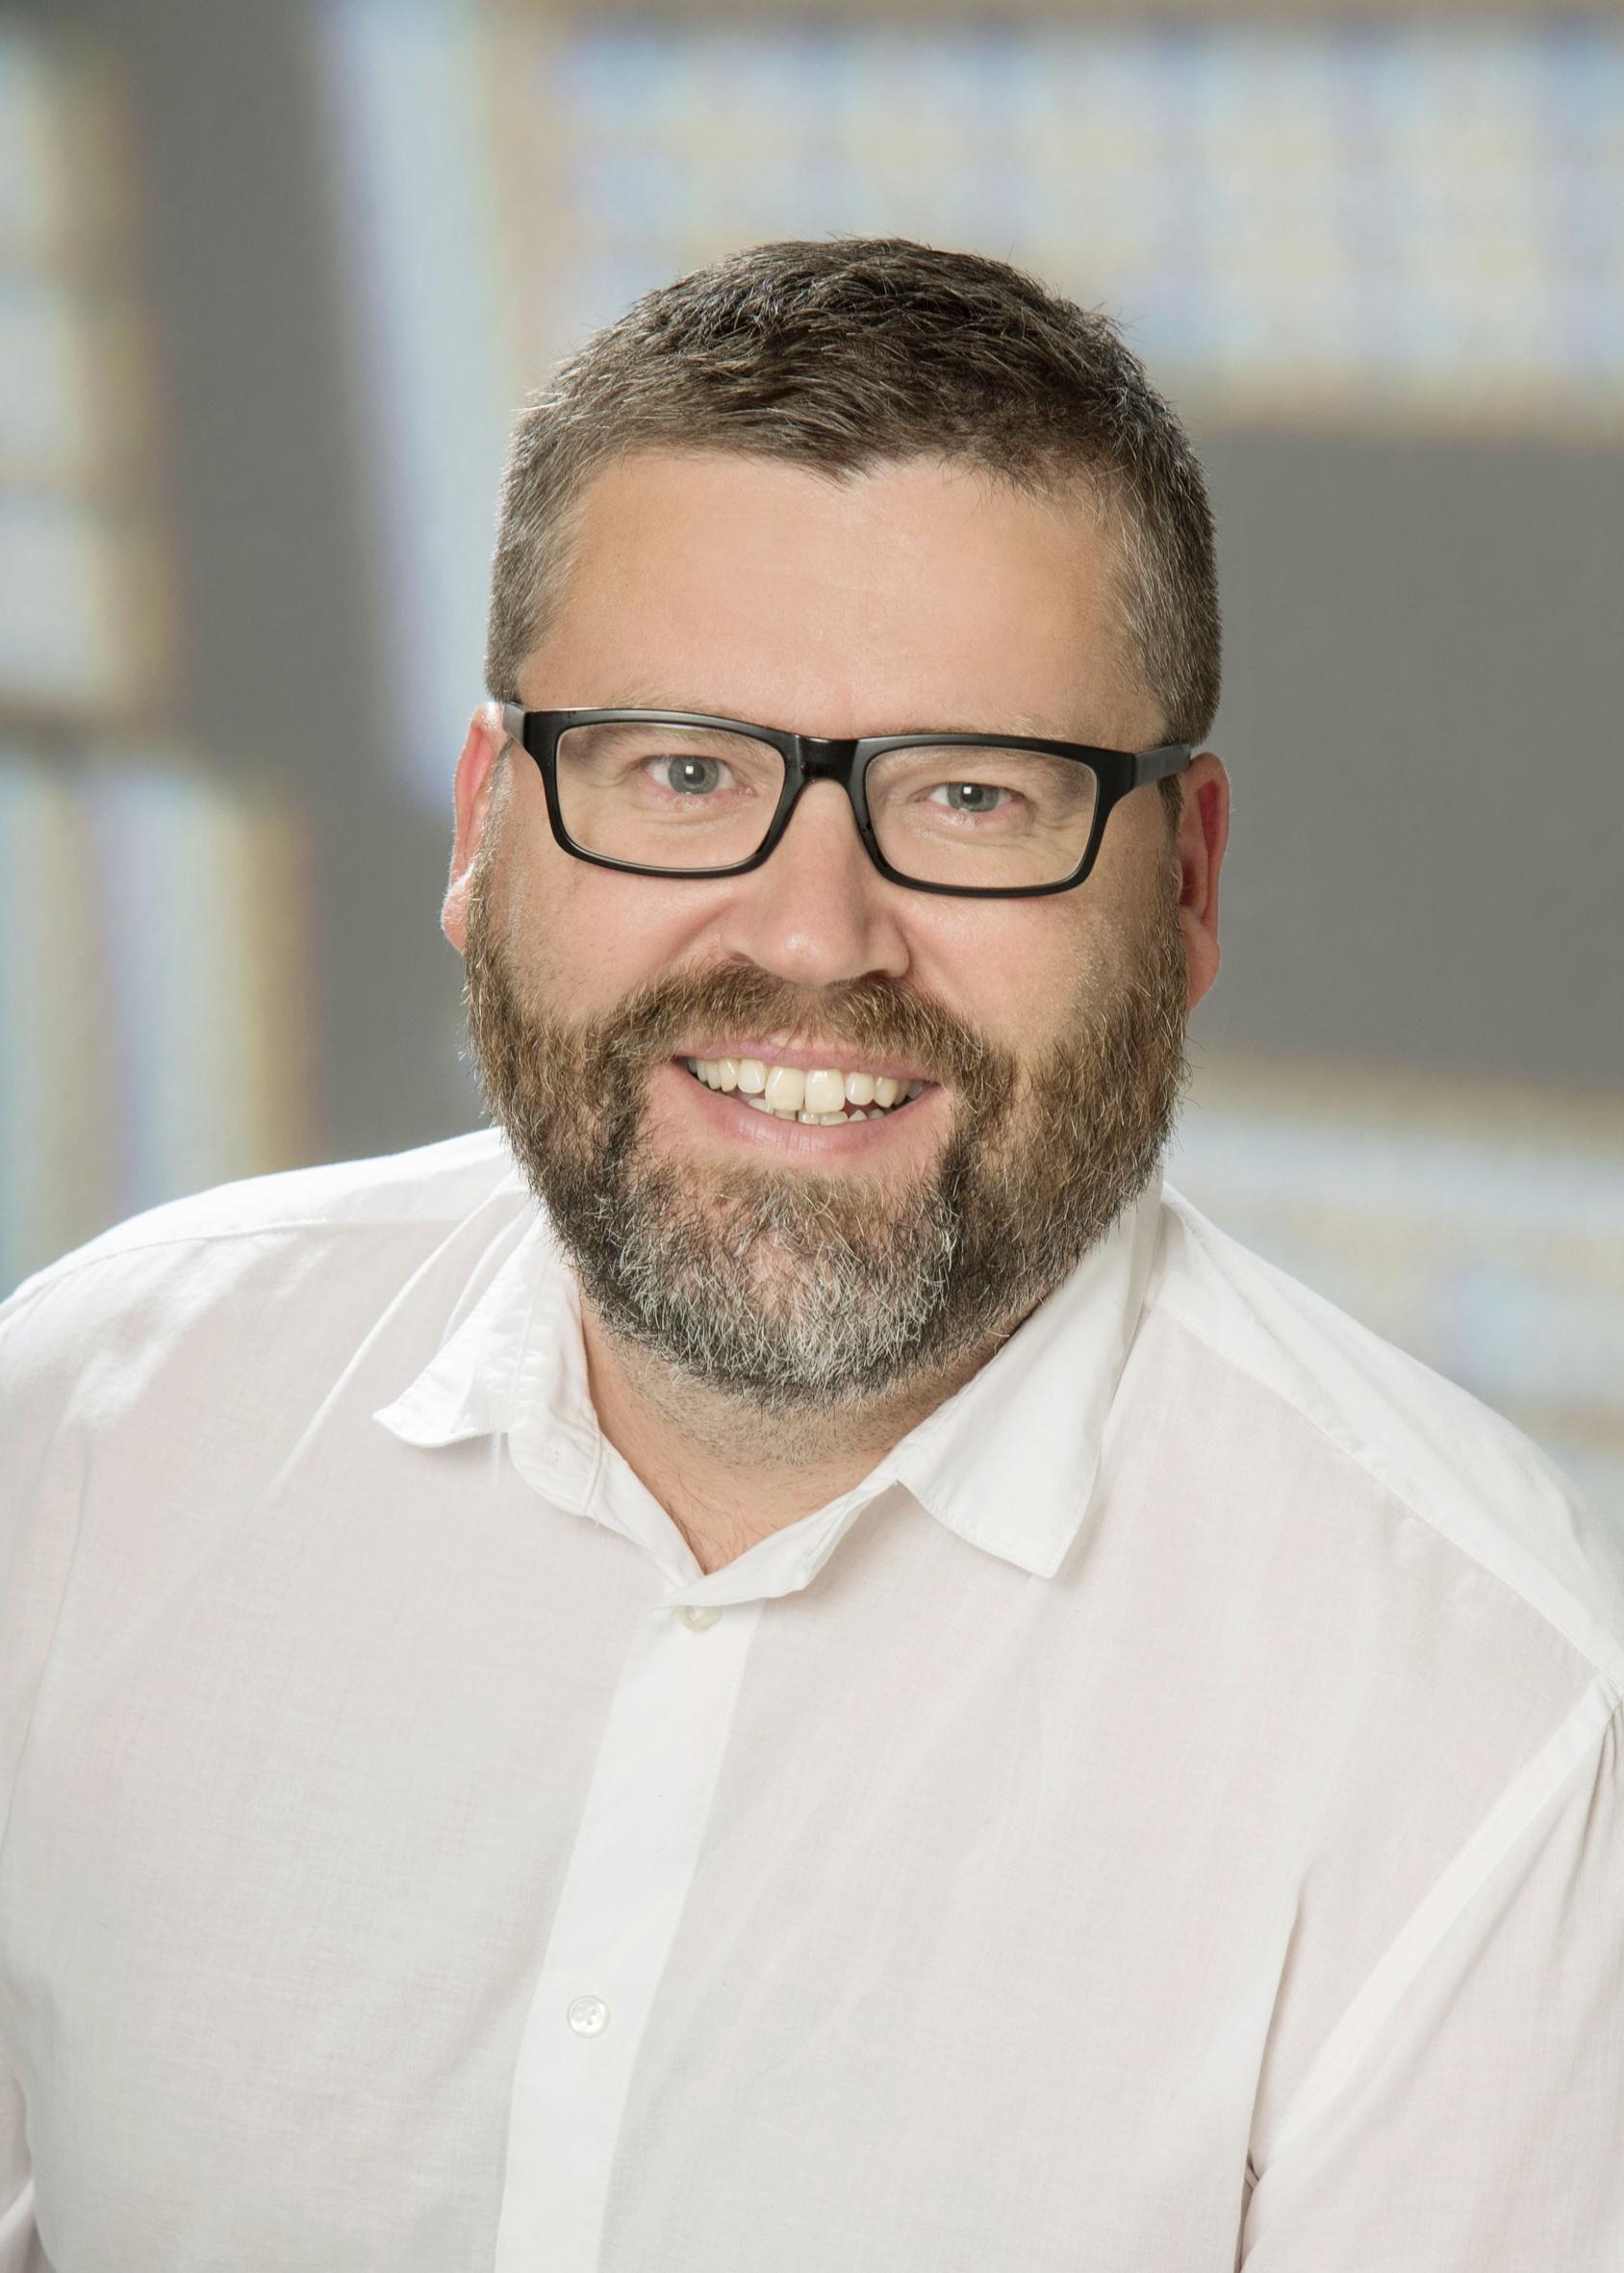 Johannes Wiesenhofer Geschäftsführer  johannes.wiesenhofer@hrservices.at